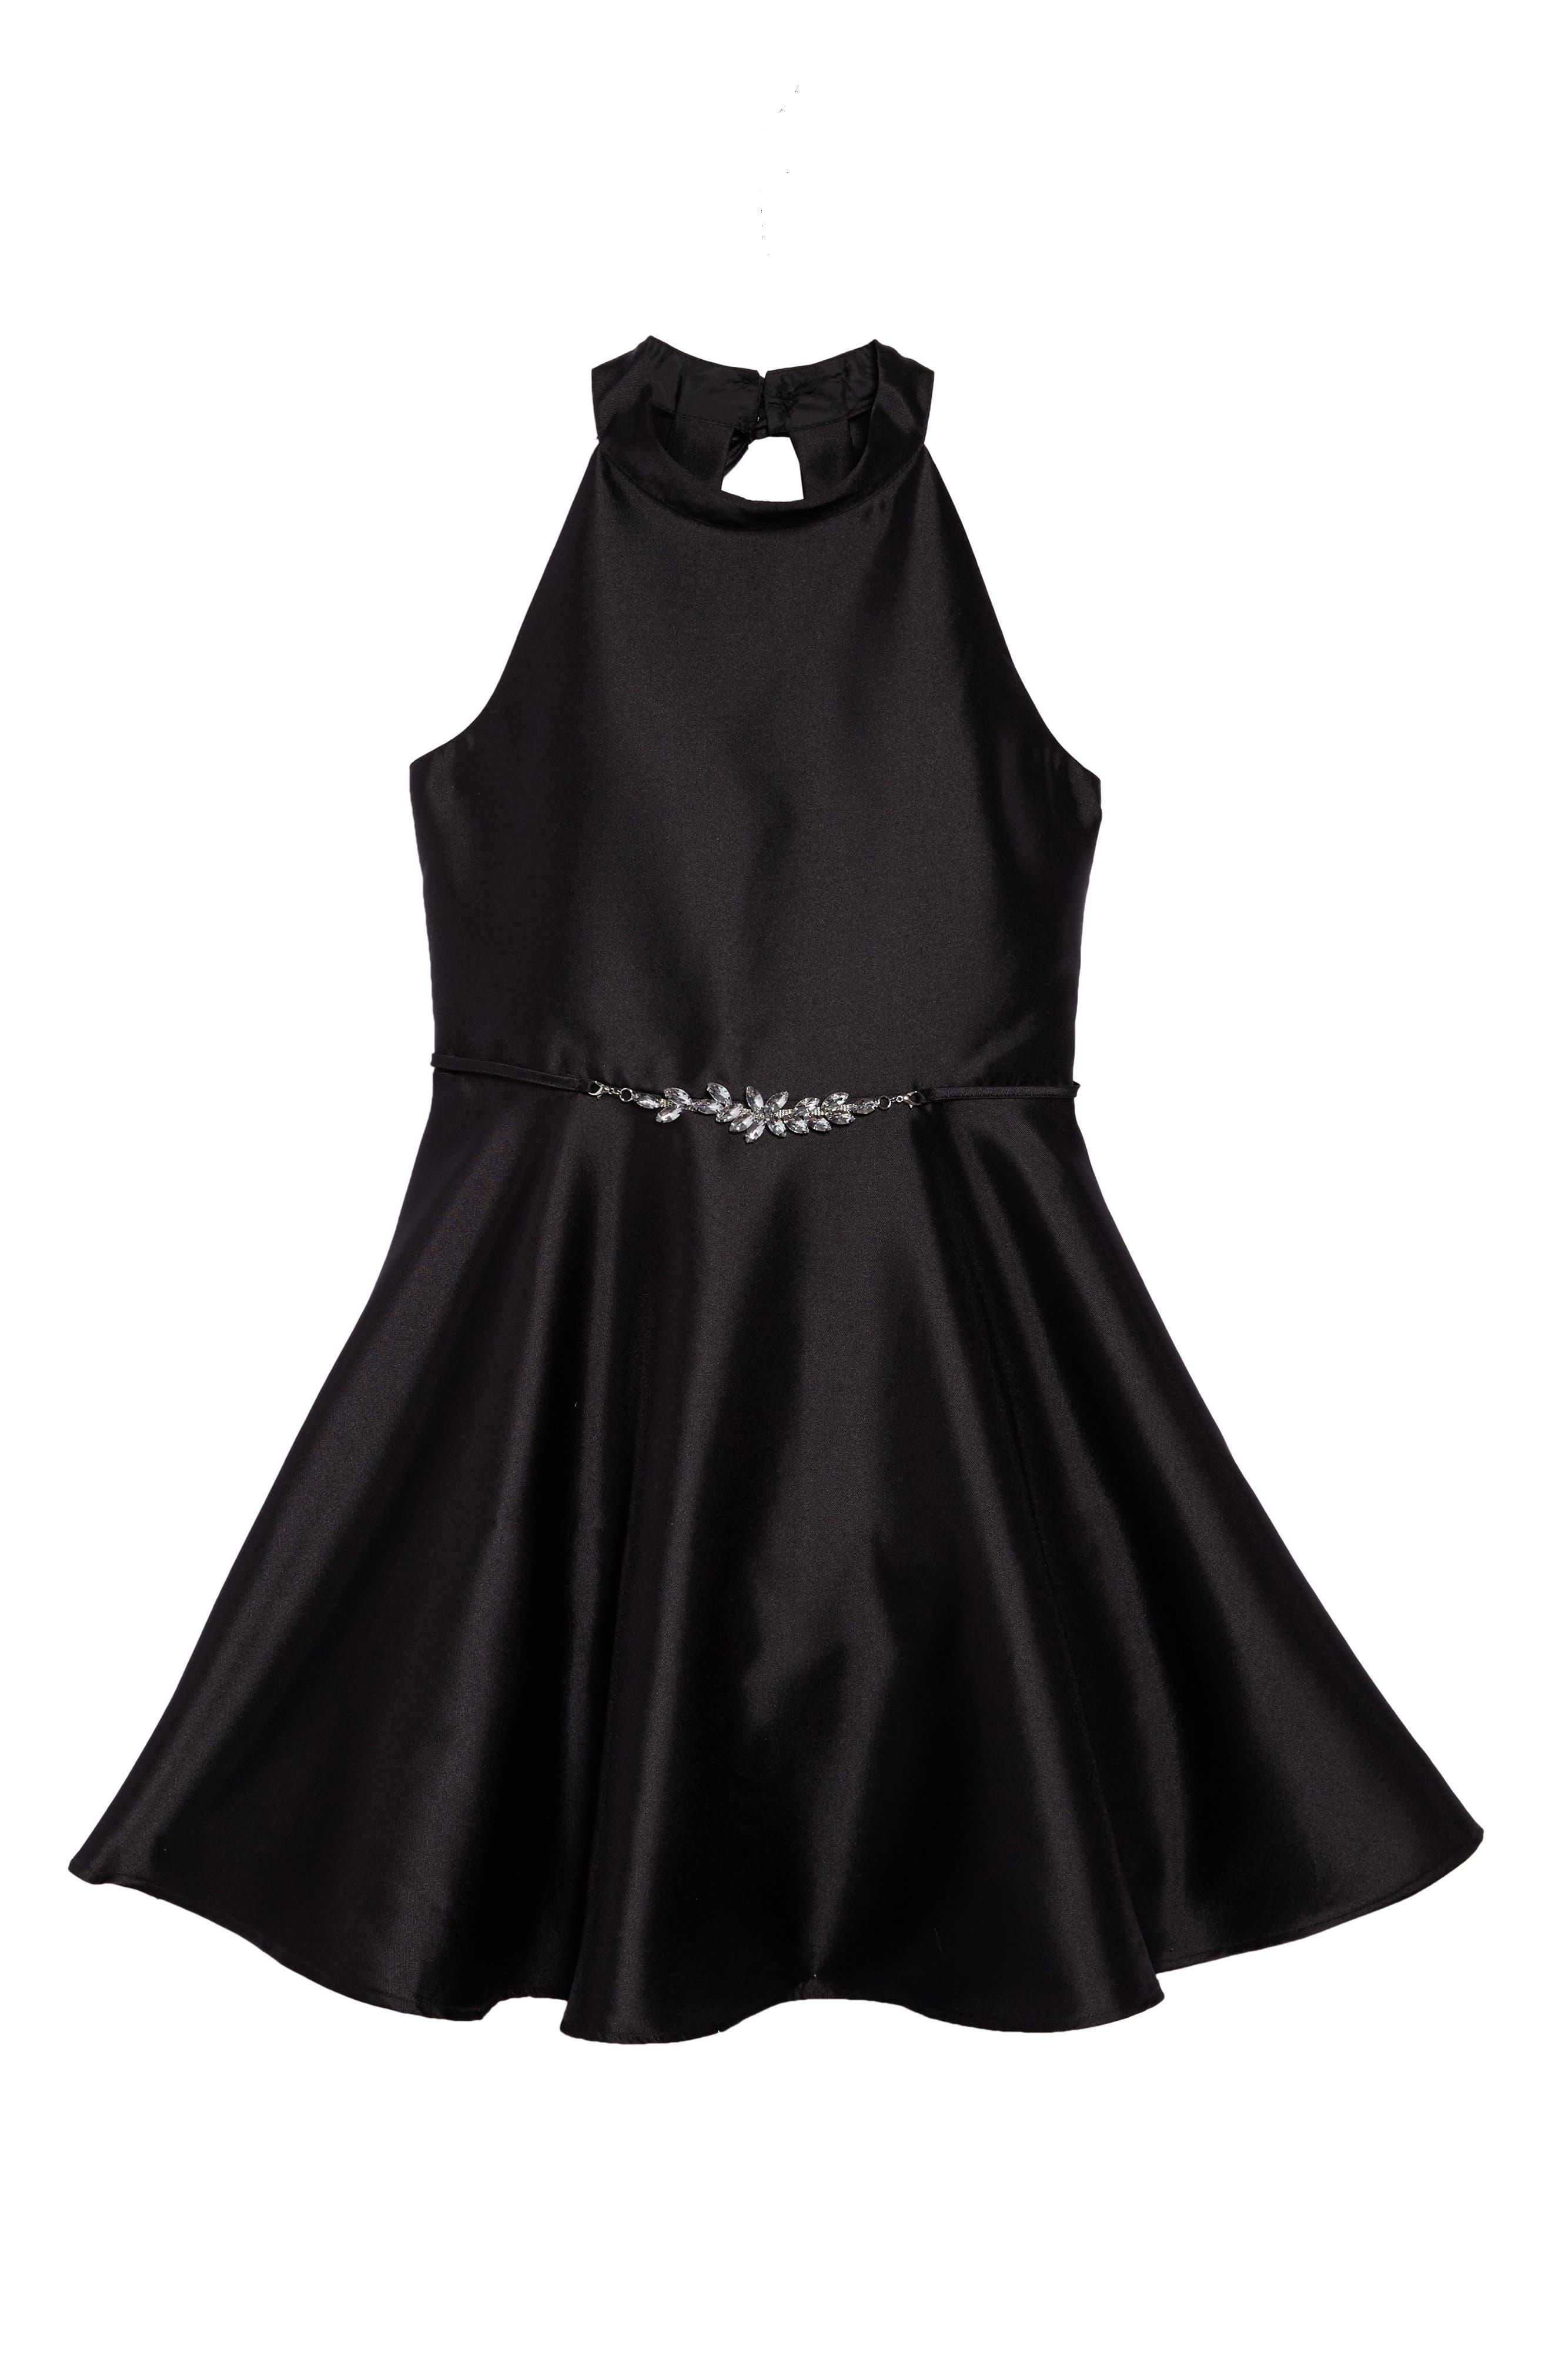 Bow Back Party Dress,                             Main thumbnail 1, color,                             001